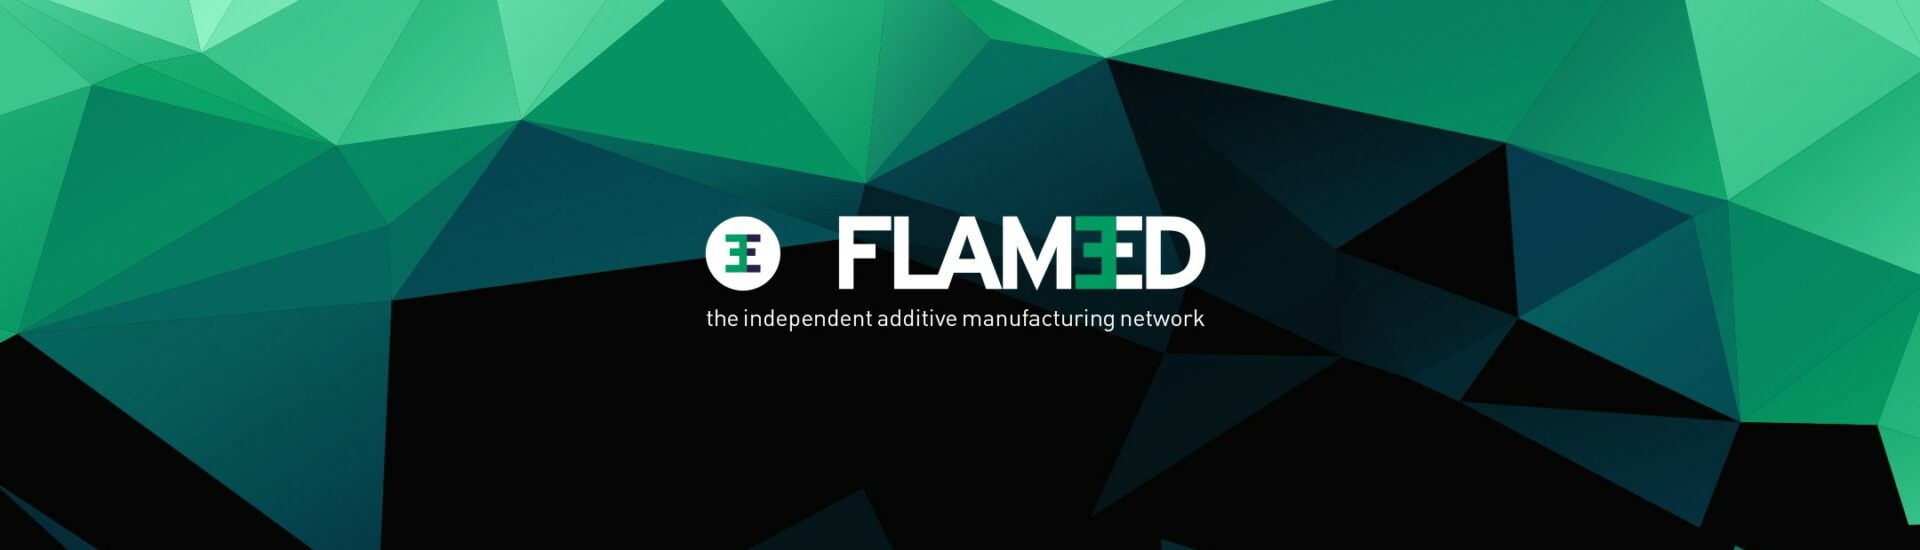 Flam3D Oceanz 3D Printing